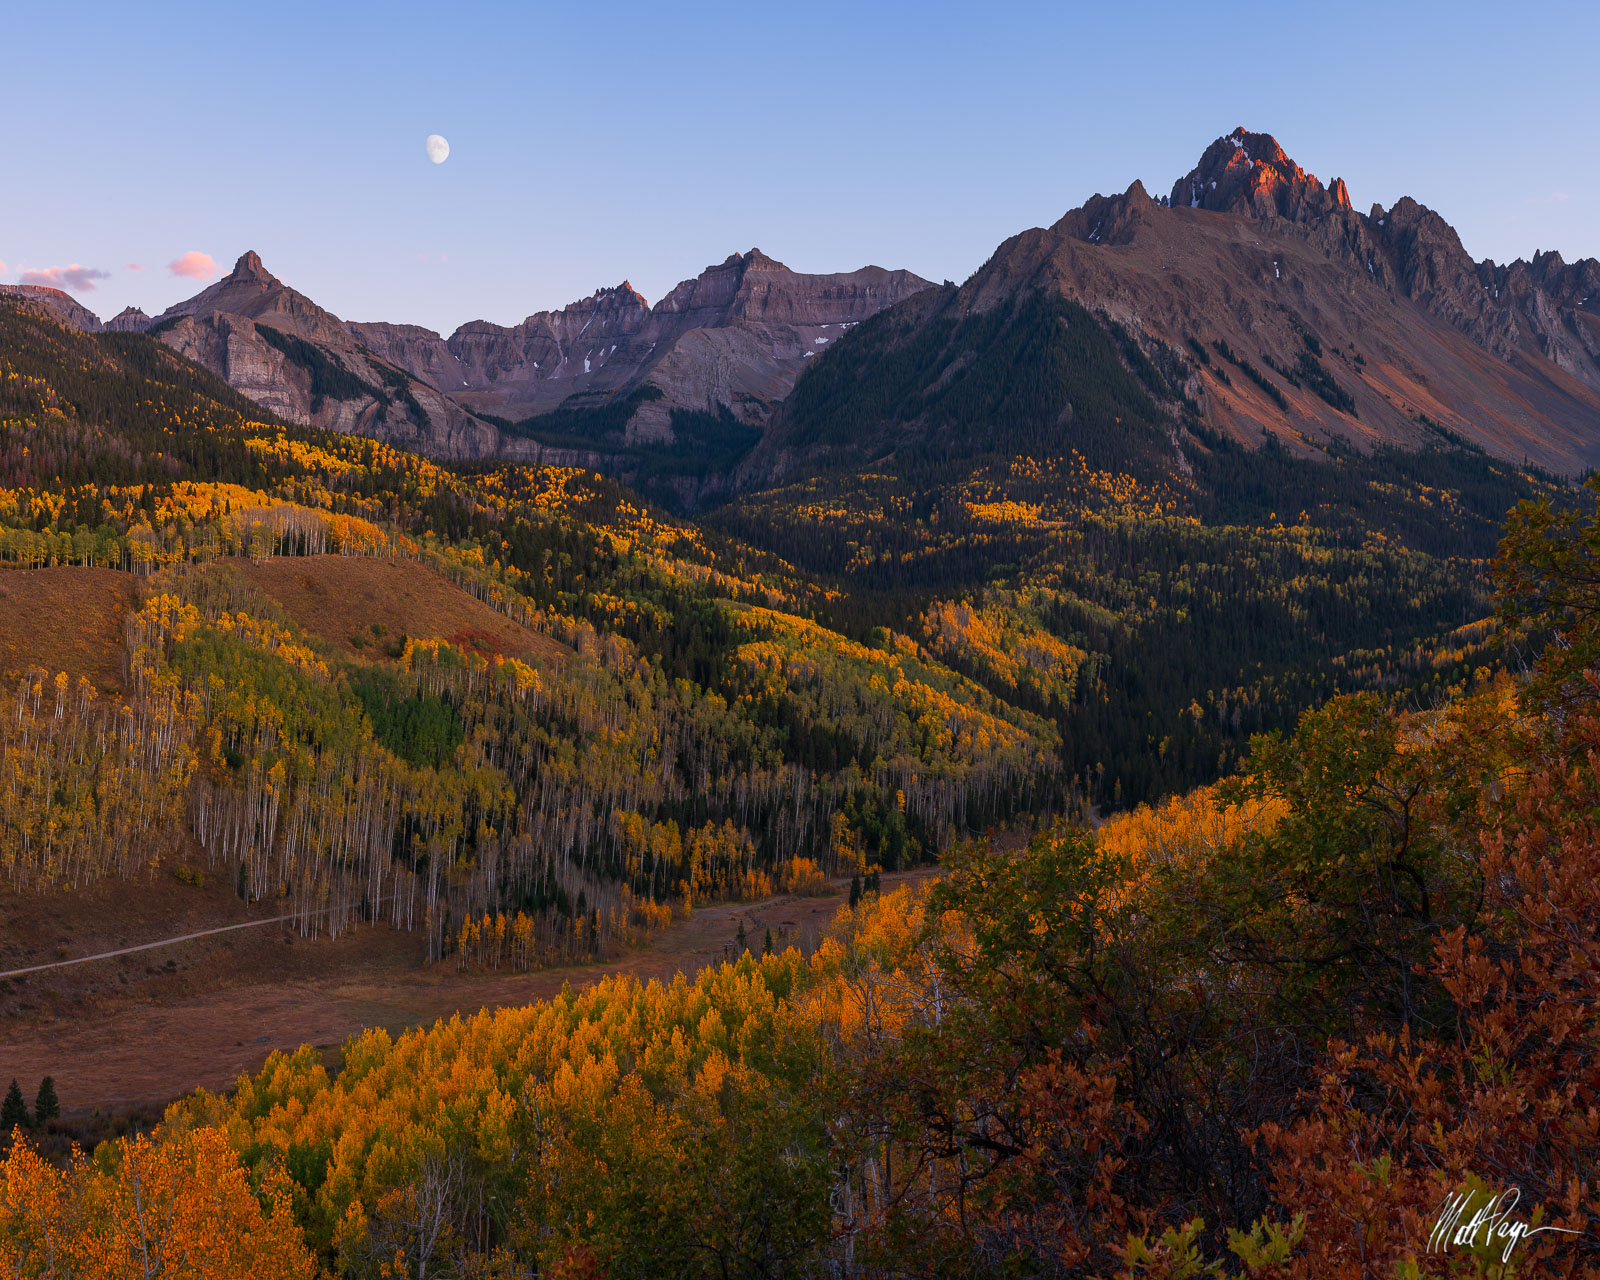 14er, Aspen Trees, Autumn, Cirque Mountain, Colorado, Fall, Fall Colors, Landscape, Moon, Mount Ridgway, Mount Sneffels, Mountains, Ridgway, Sunset, Teakettle Mountain, San Juan Mountains, photo